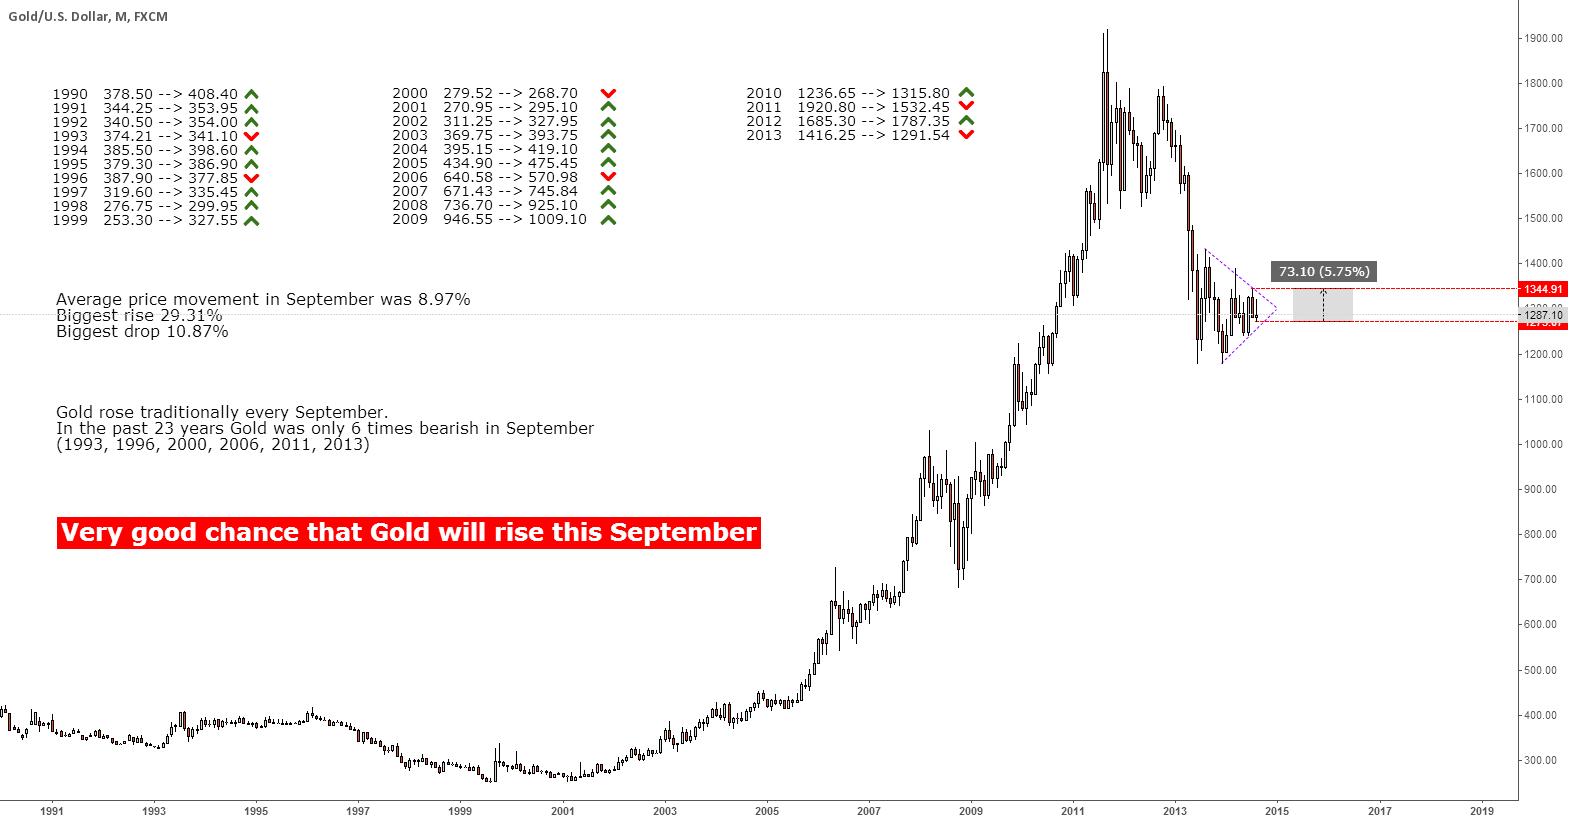 #Gold 1990-2013 September stats